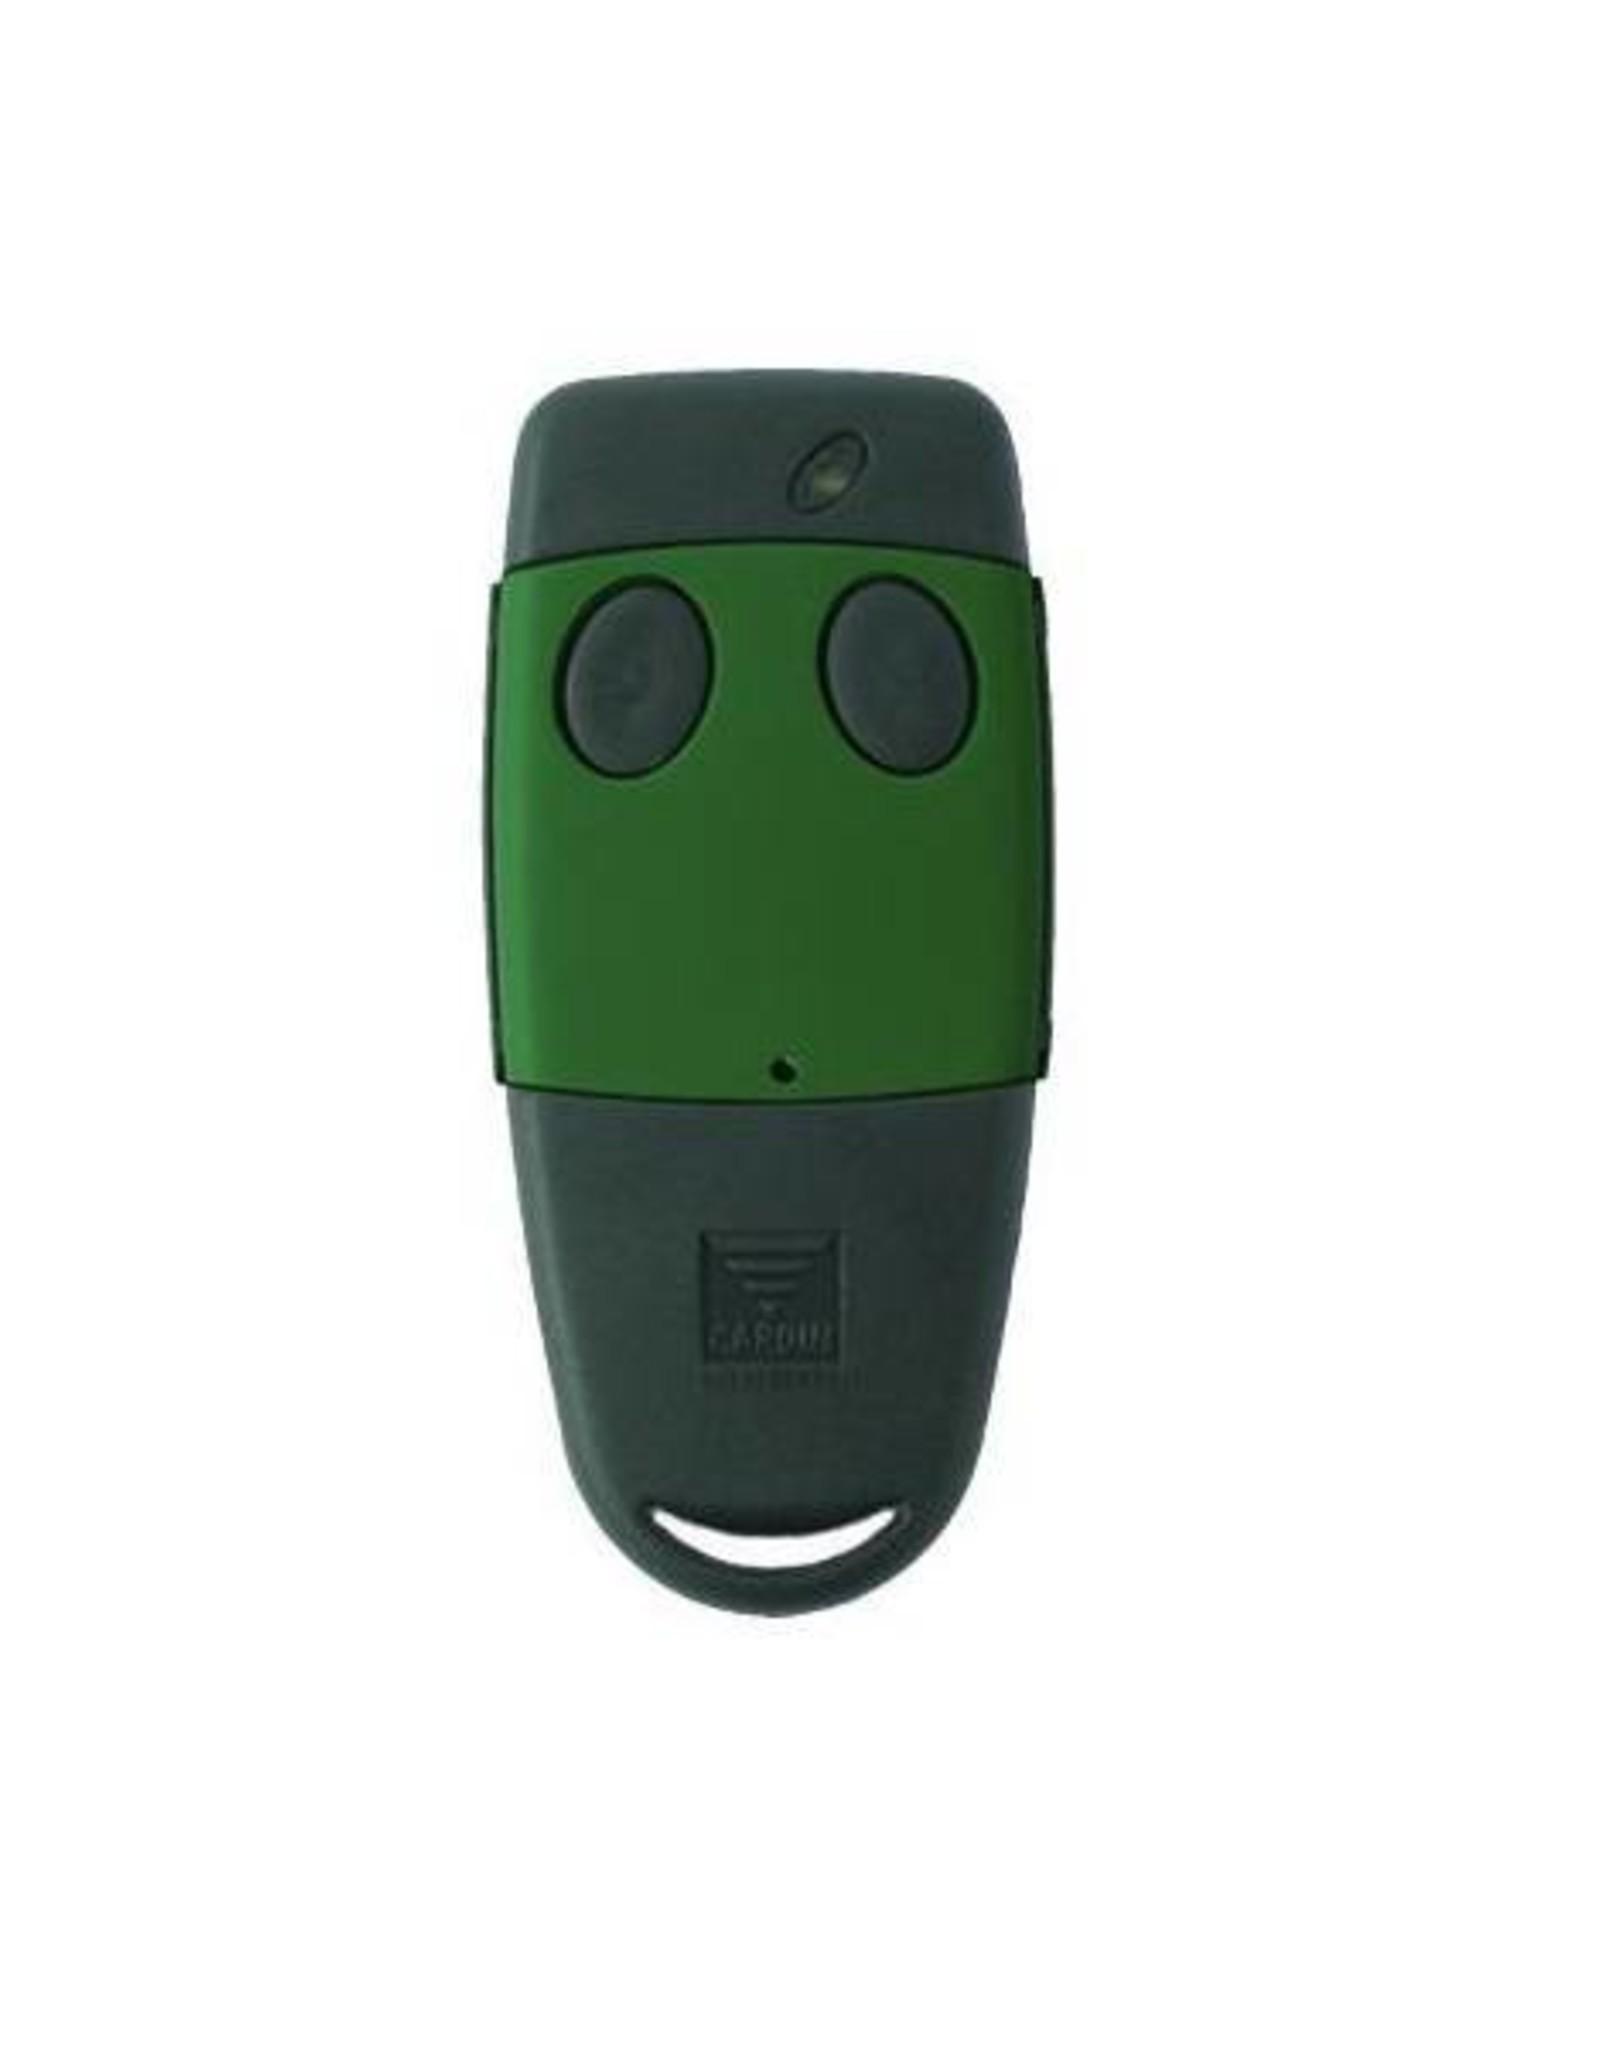 Cardin Cardin S449-QZ2 handzender groen 2-kanaals